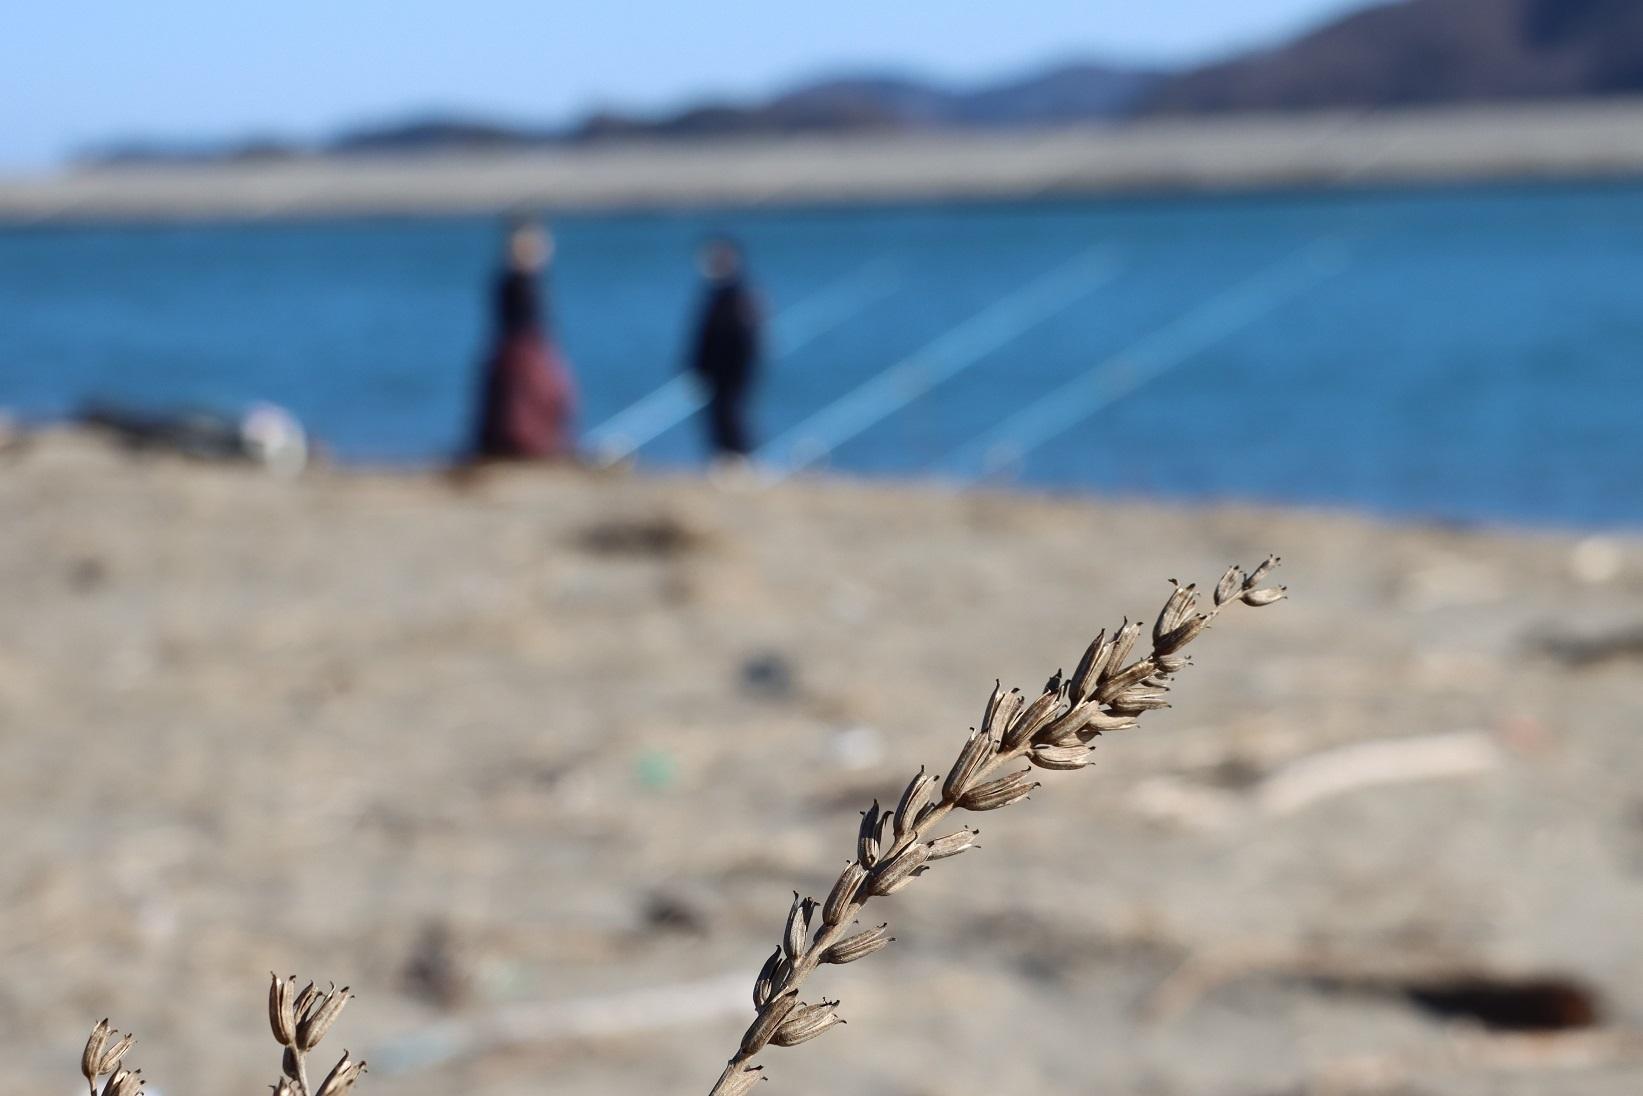 北上川河口の砂浜1